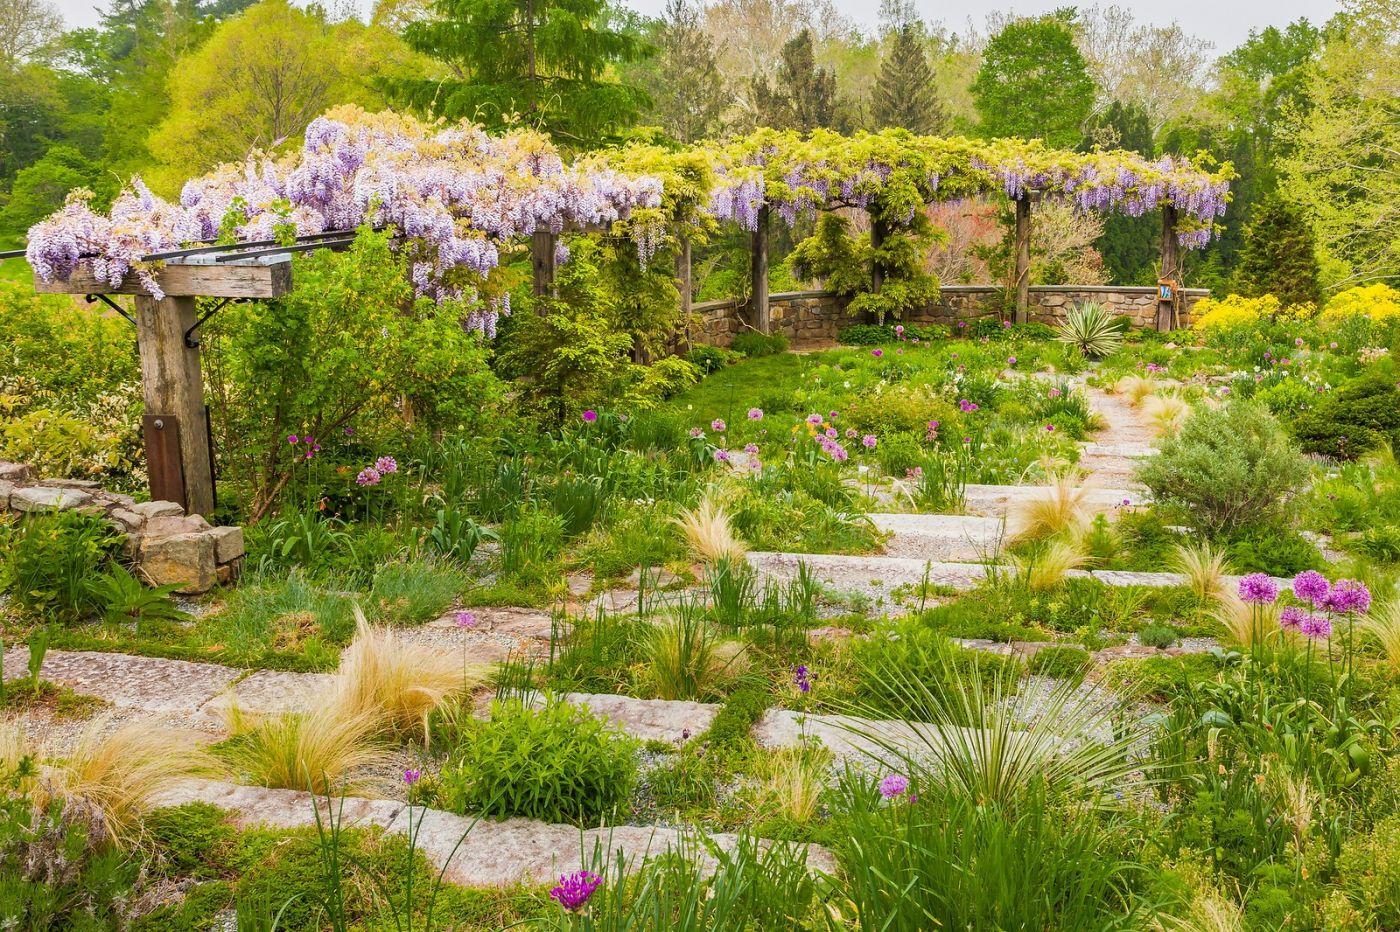 Chanticleer花园,那年盛开的紫藤花_图1-9